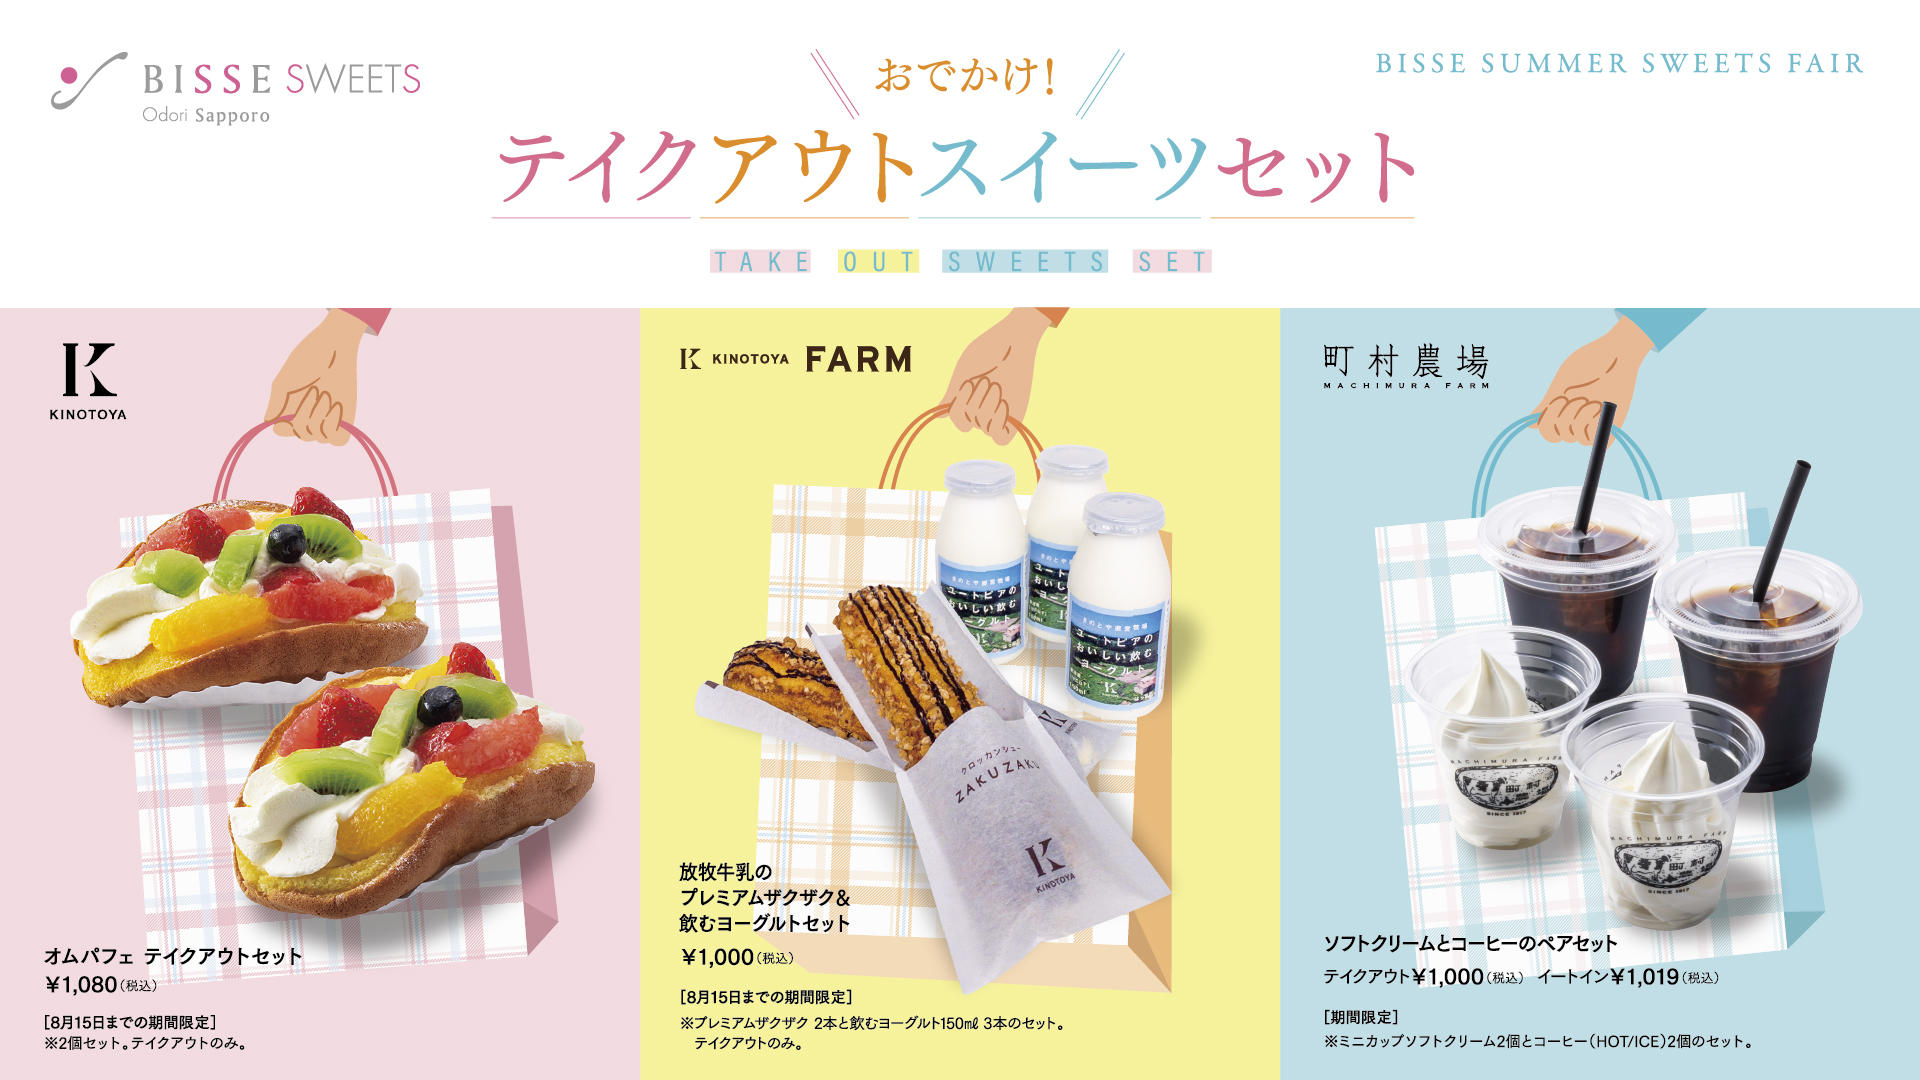 https://www.odori-bisse.com/info/news_210521_img1.jpg